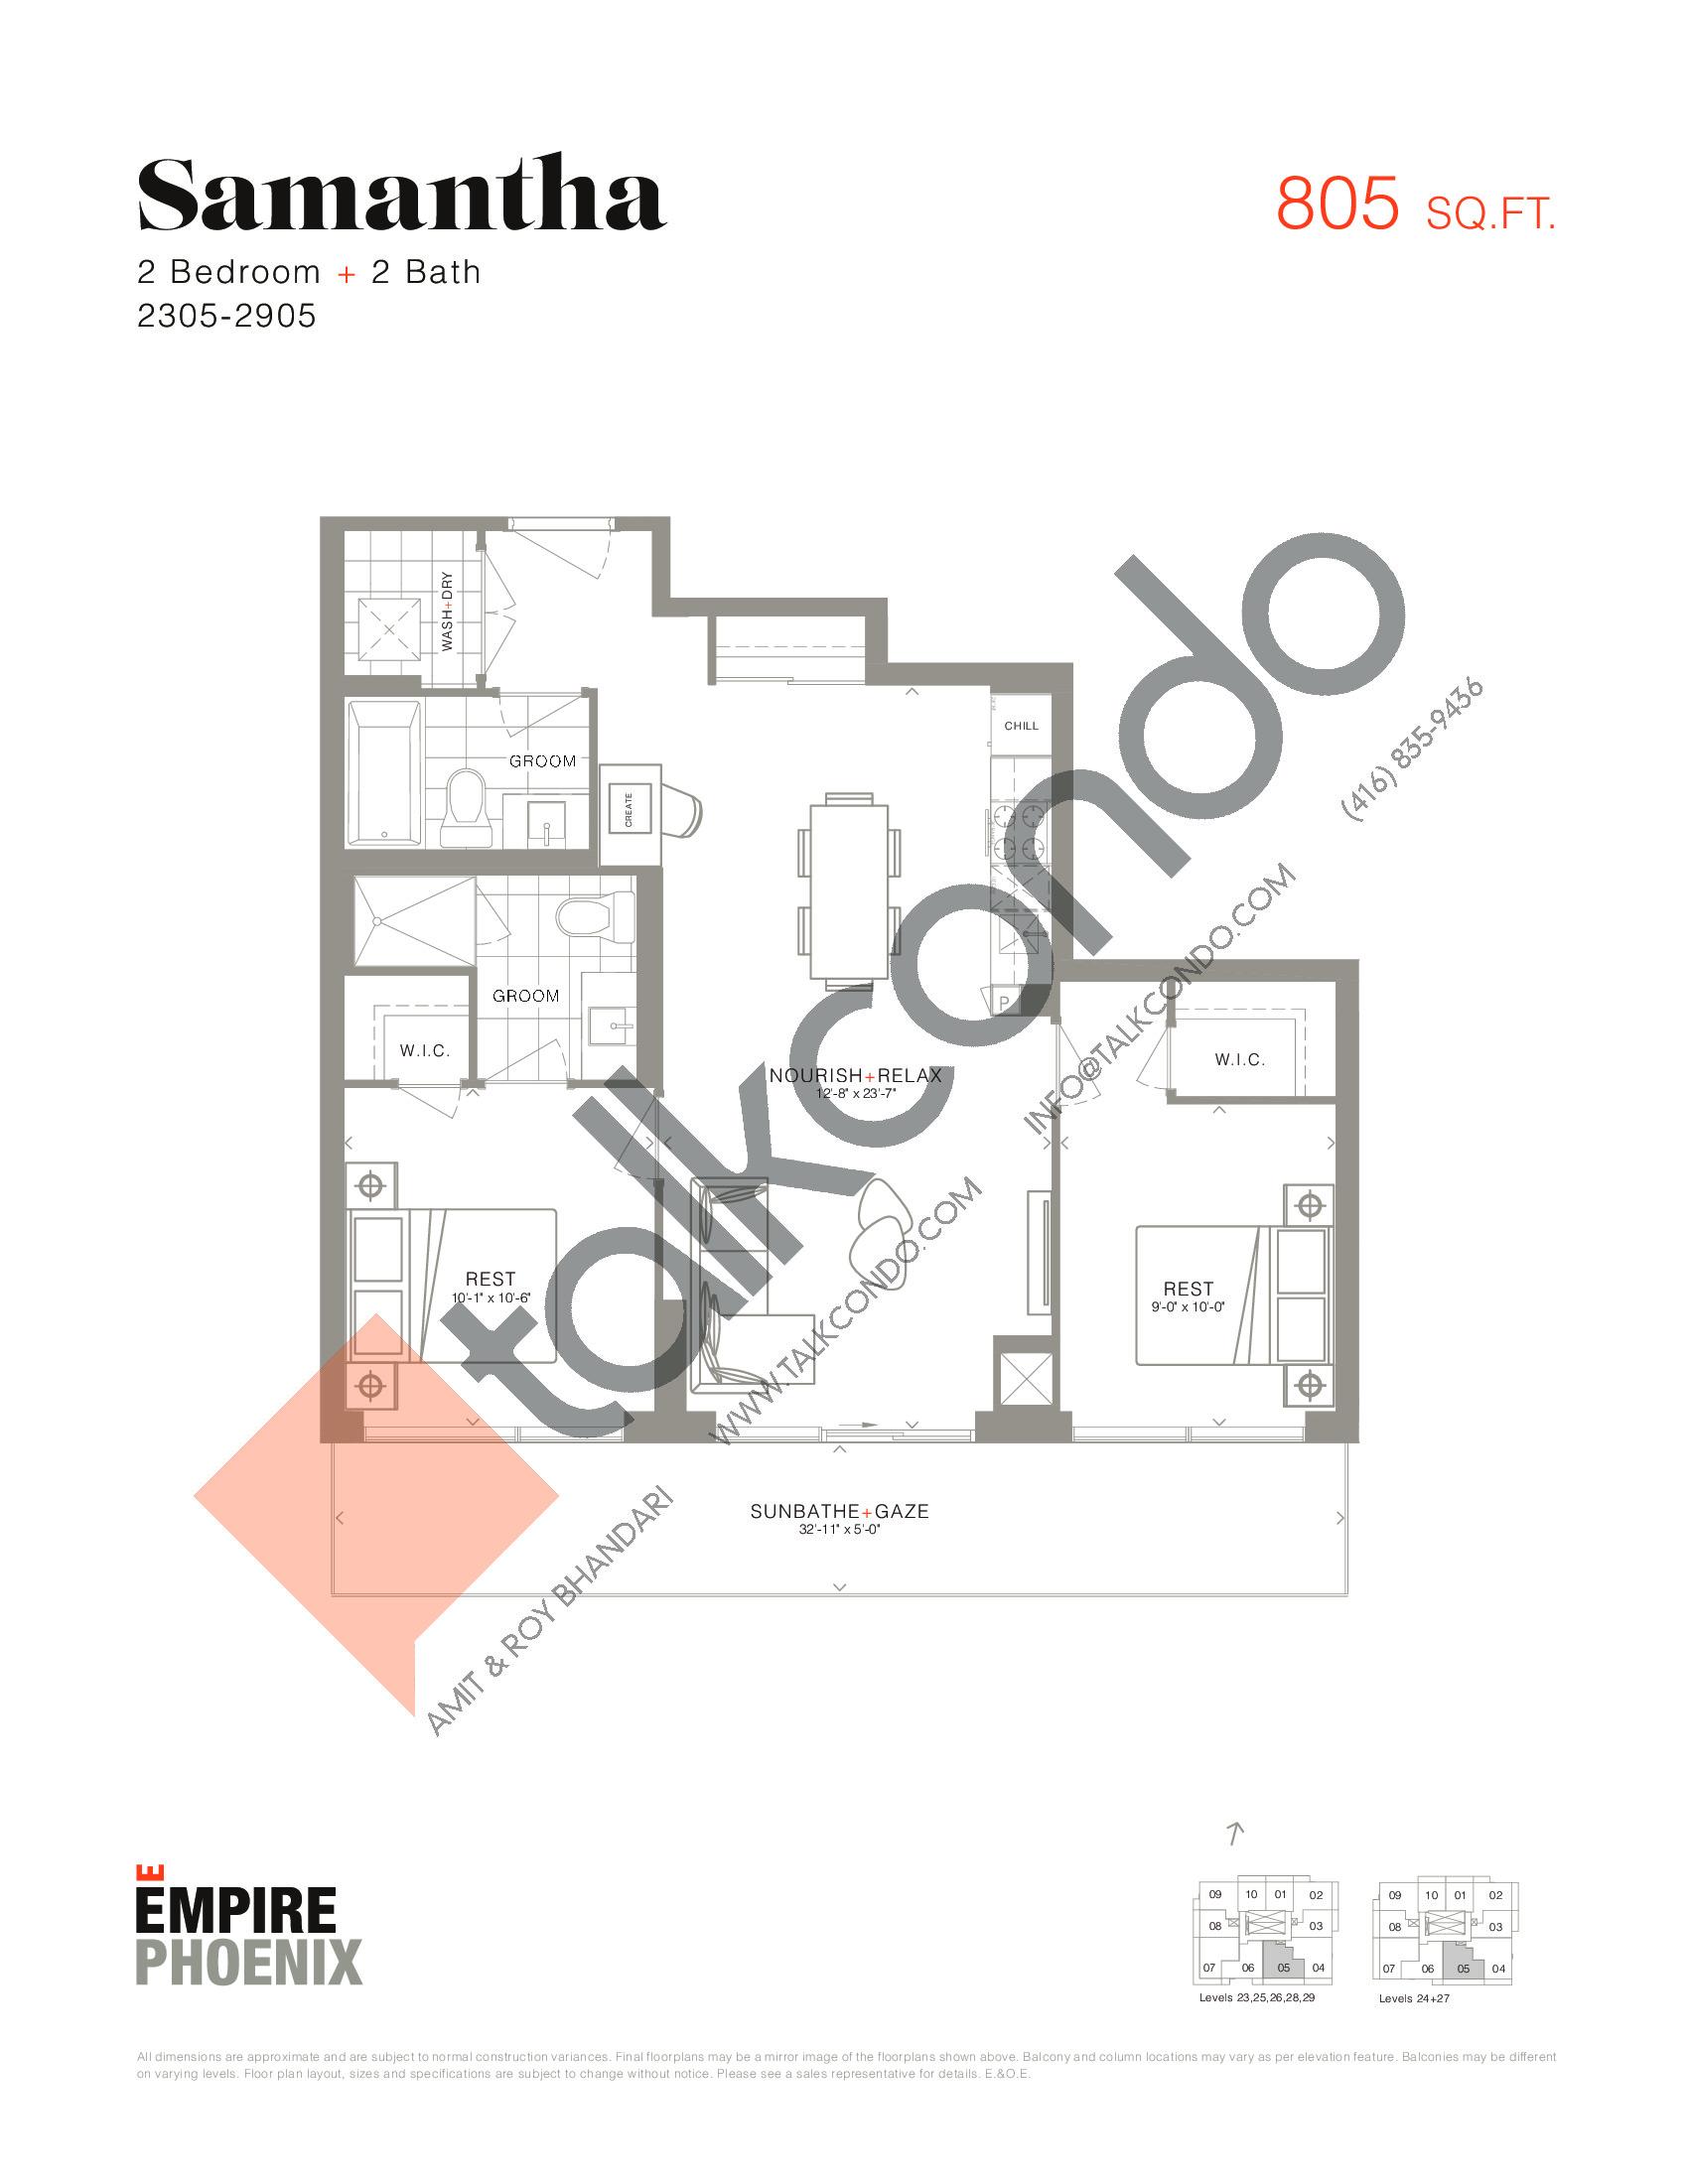 Samantha Floor Plan at Empire Phoenix Phase 2 Condos - 805 sq.ft